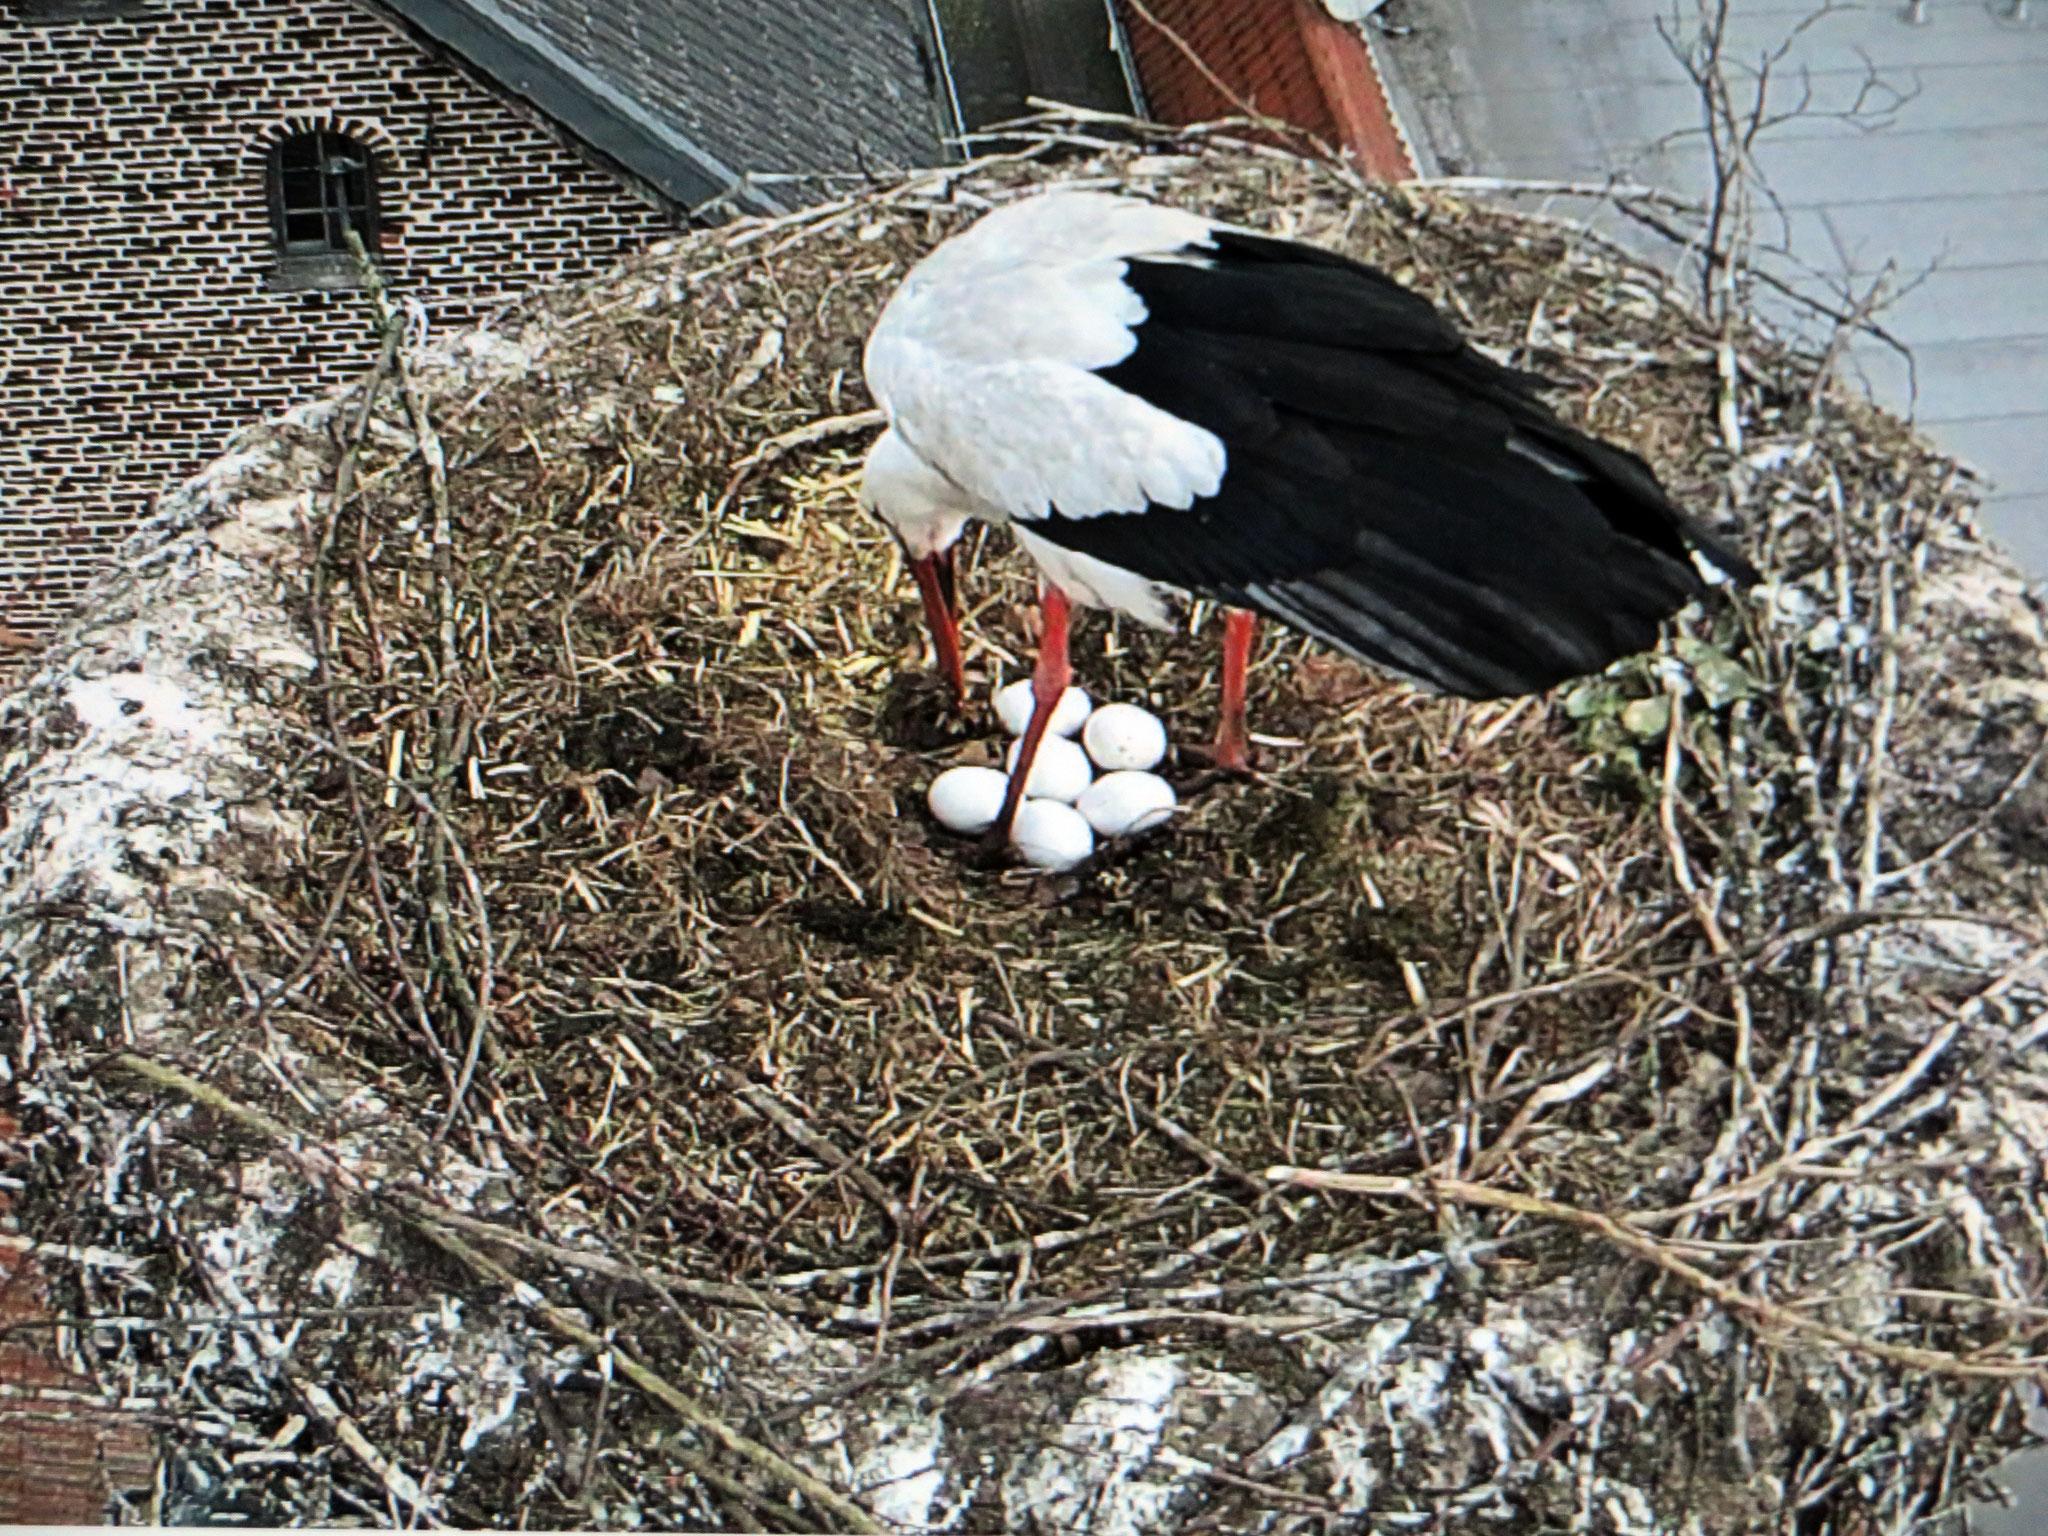 6. April - sechs Eier